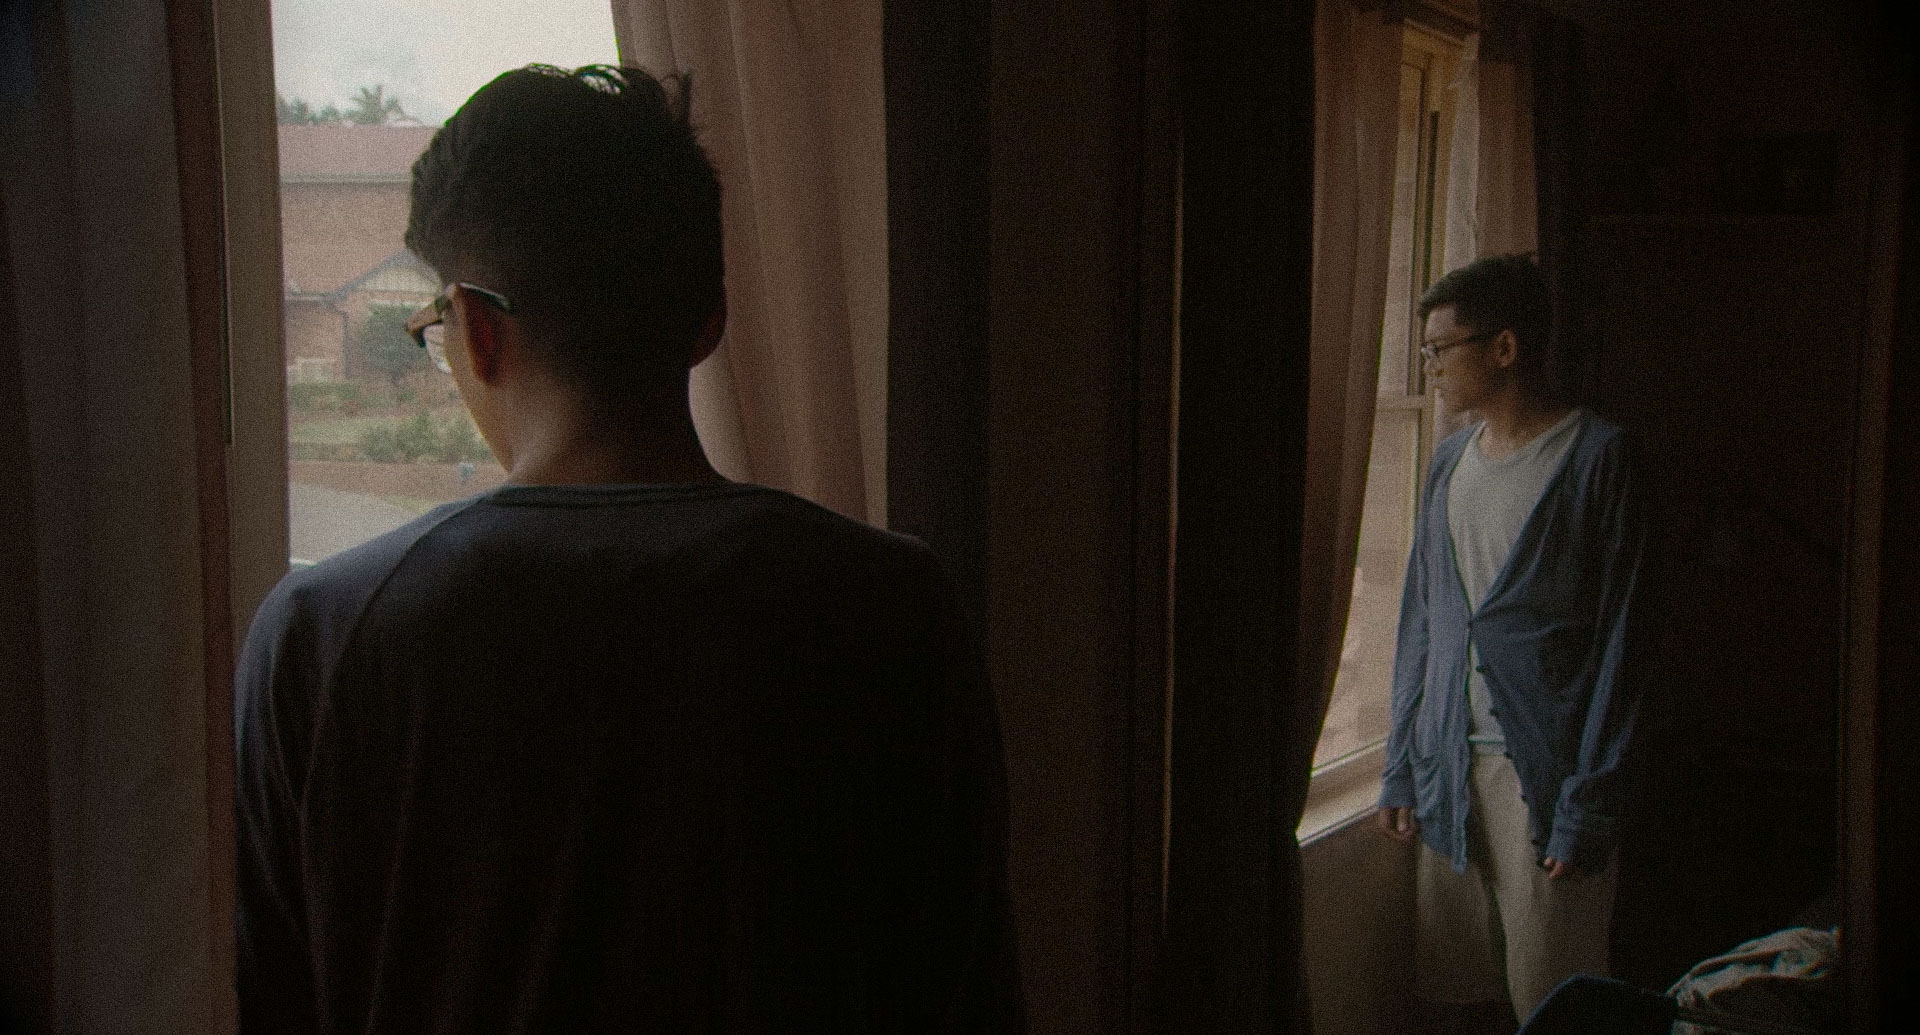 WINDOW | SHORT FILM  Director: Vonne Patiag  Director of Photography: Dimitri Zaunders   MORE